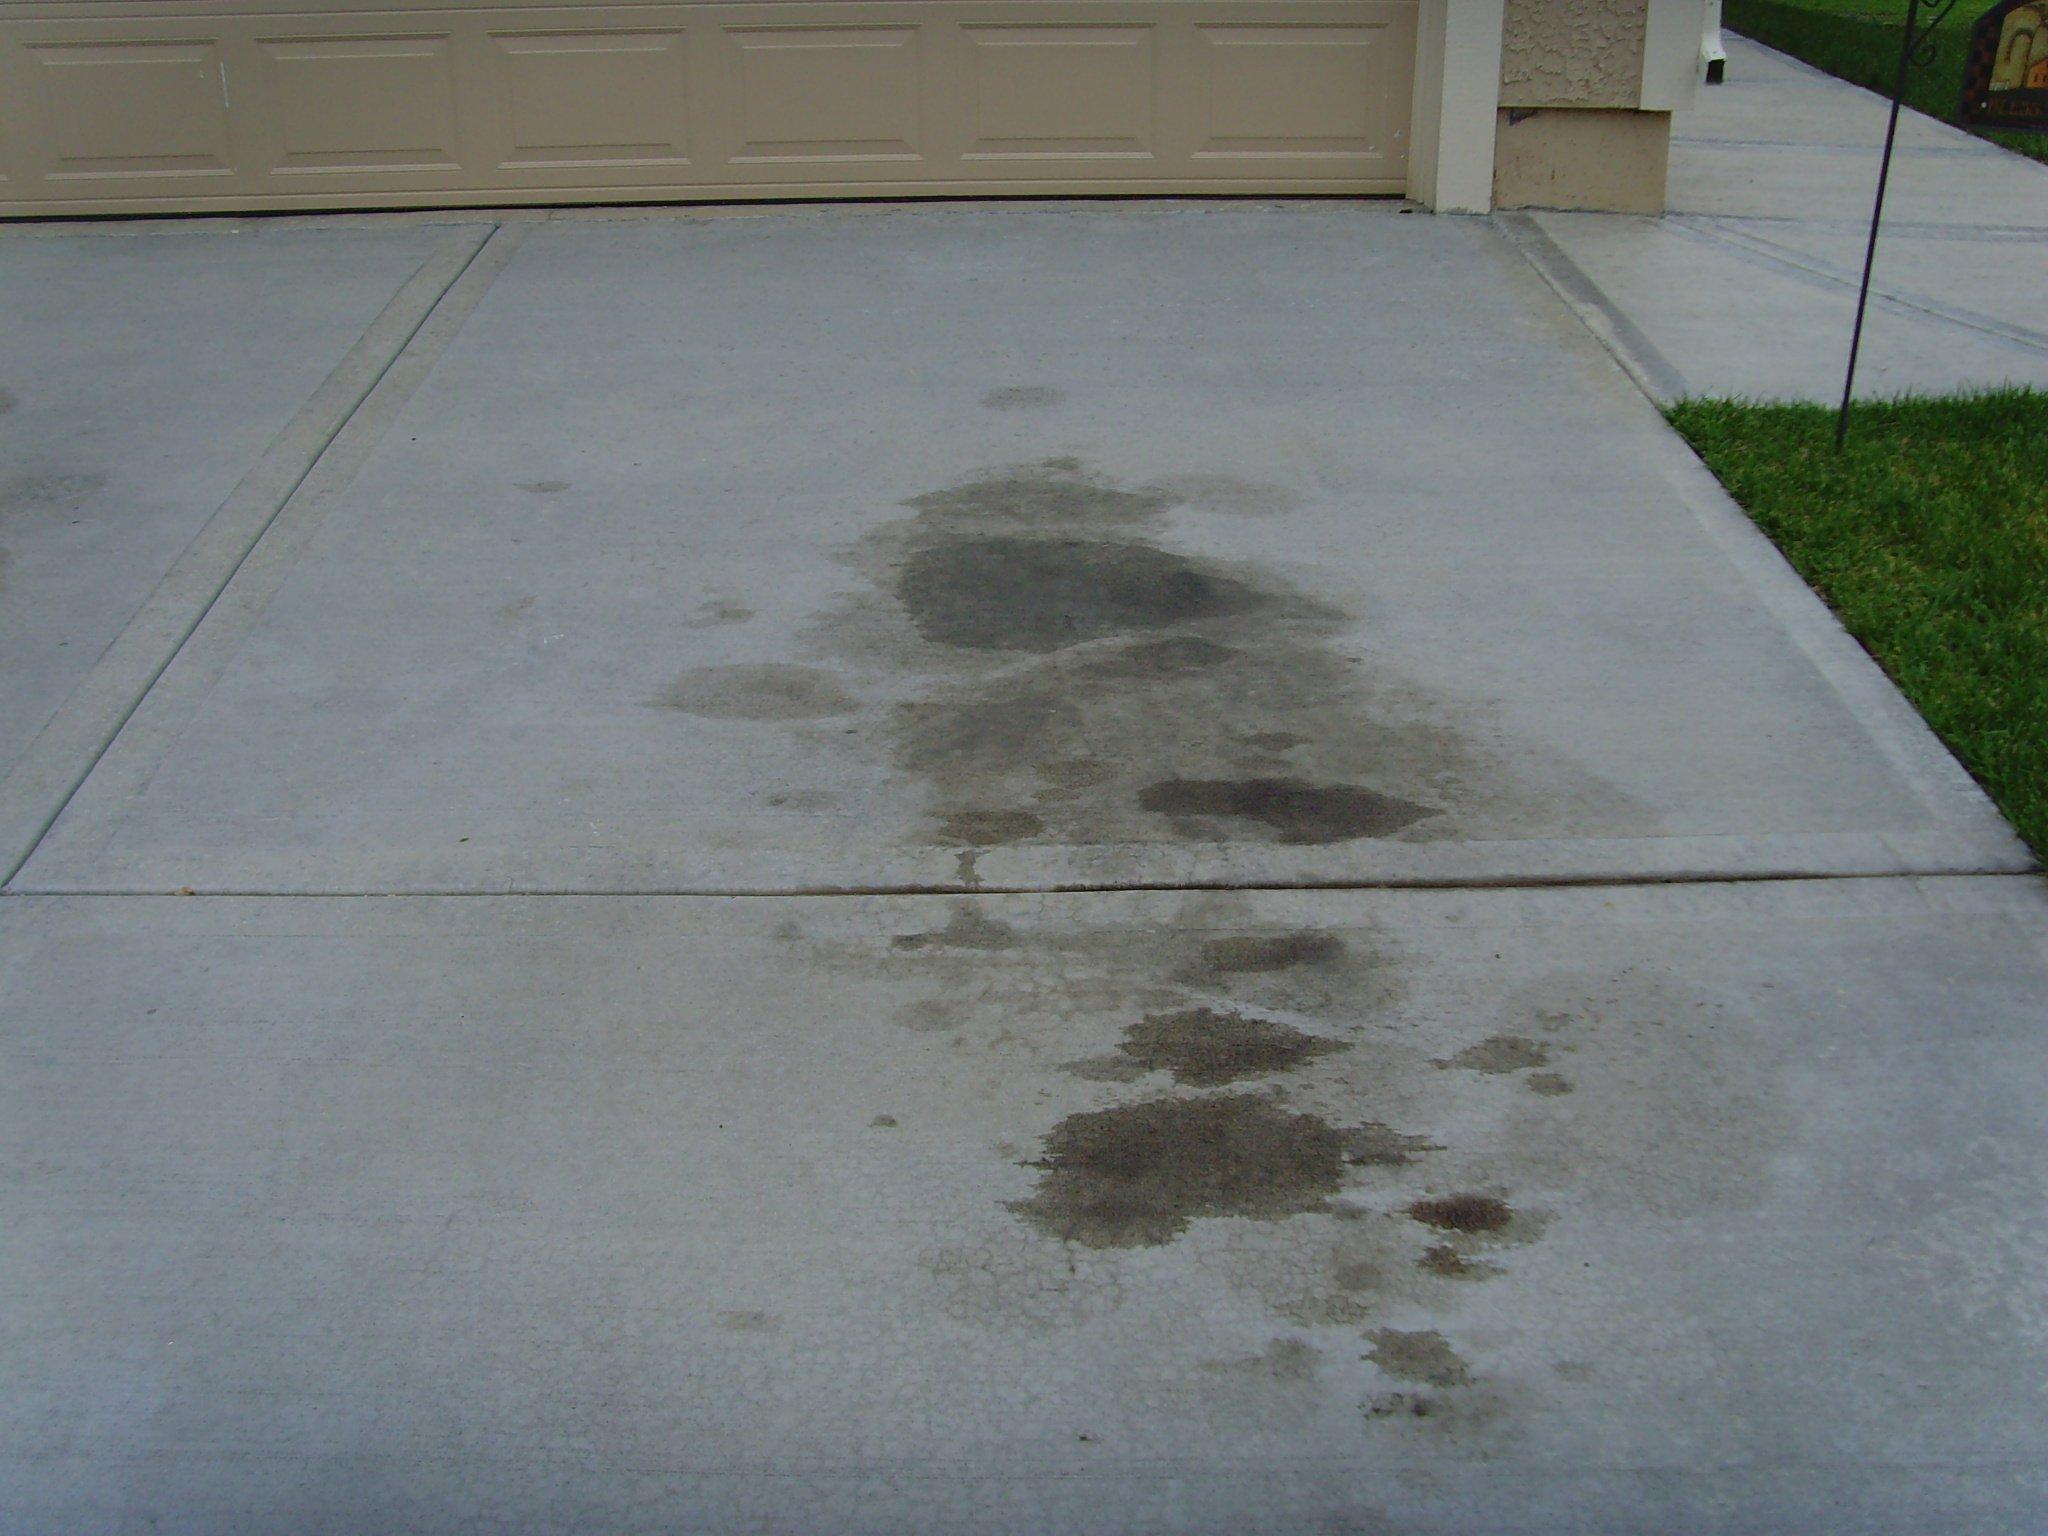 Driveway-oil-stain.jpg (2048×1536)